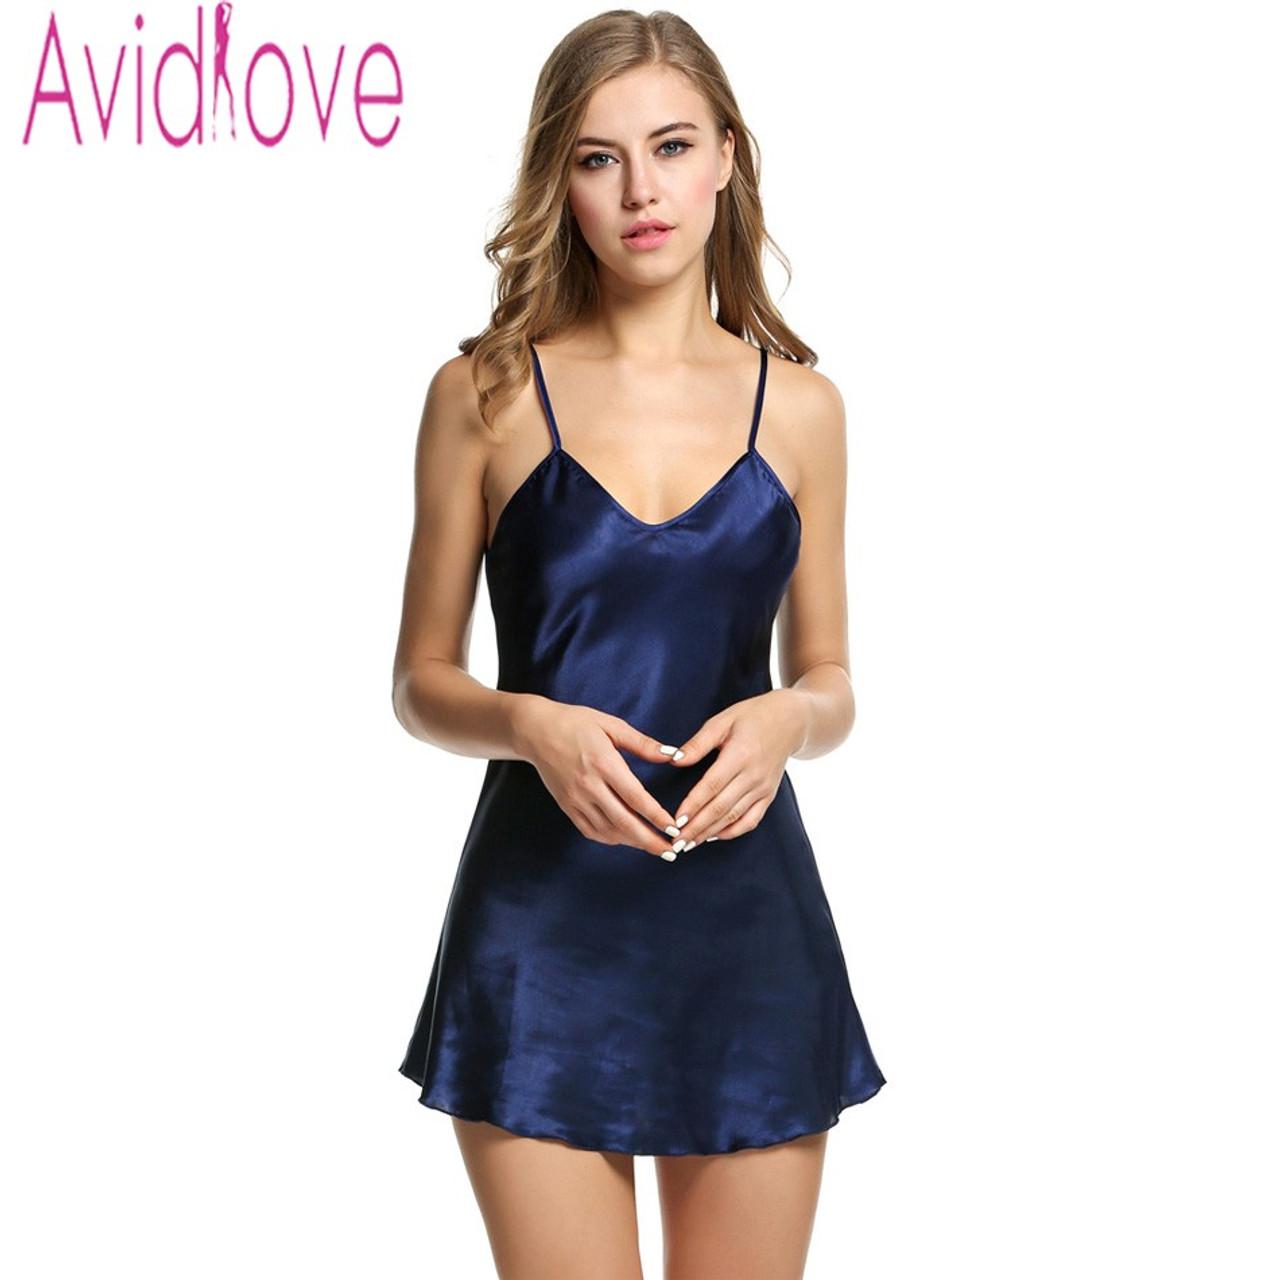 76aec5e452 ... Avidlove Stain Nightgown Women Slik Sleepwear Sexy Night Dress V Neck  Strap Solid Nightwear Sleep Dress ...